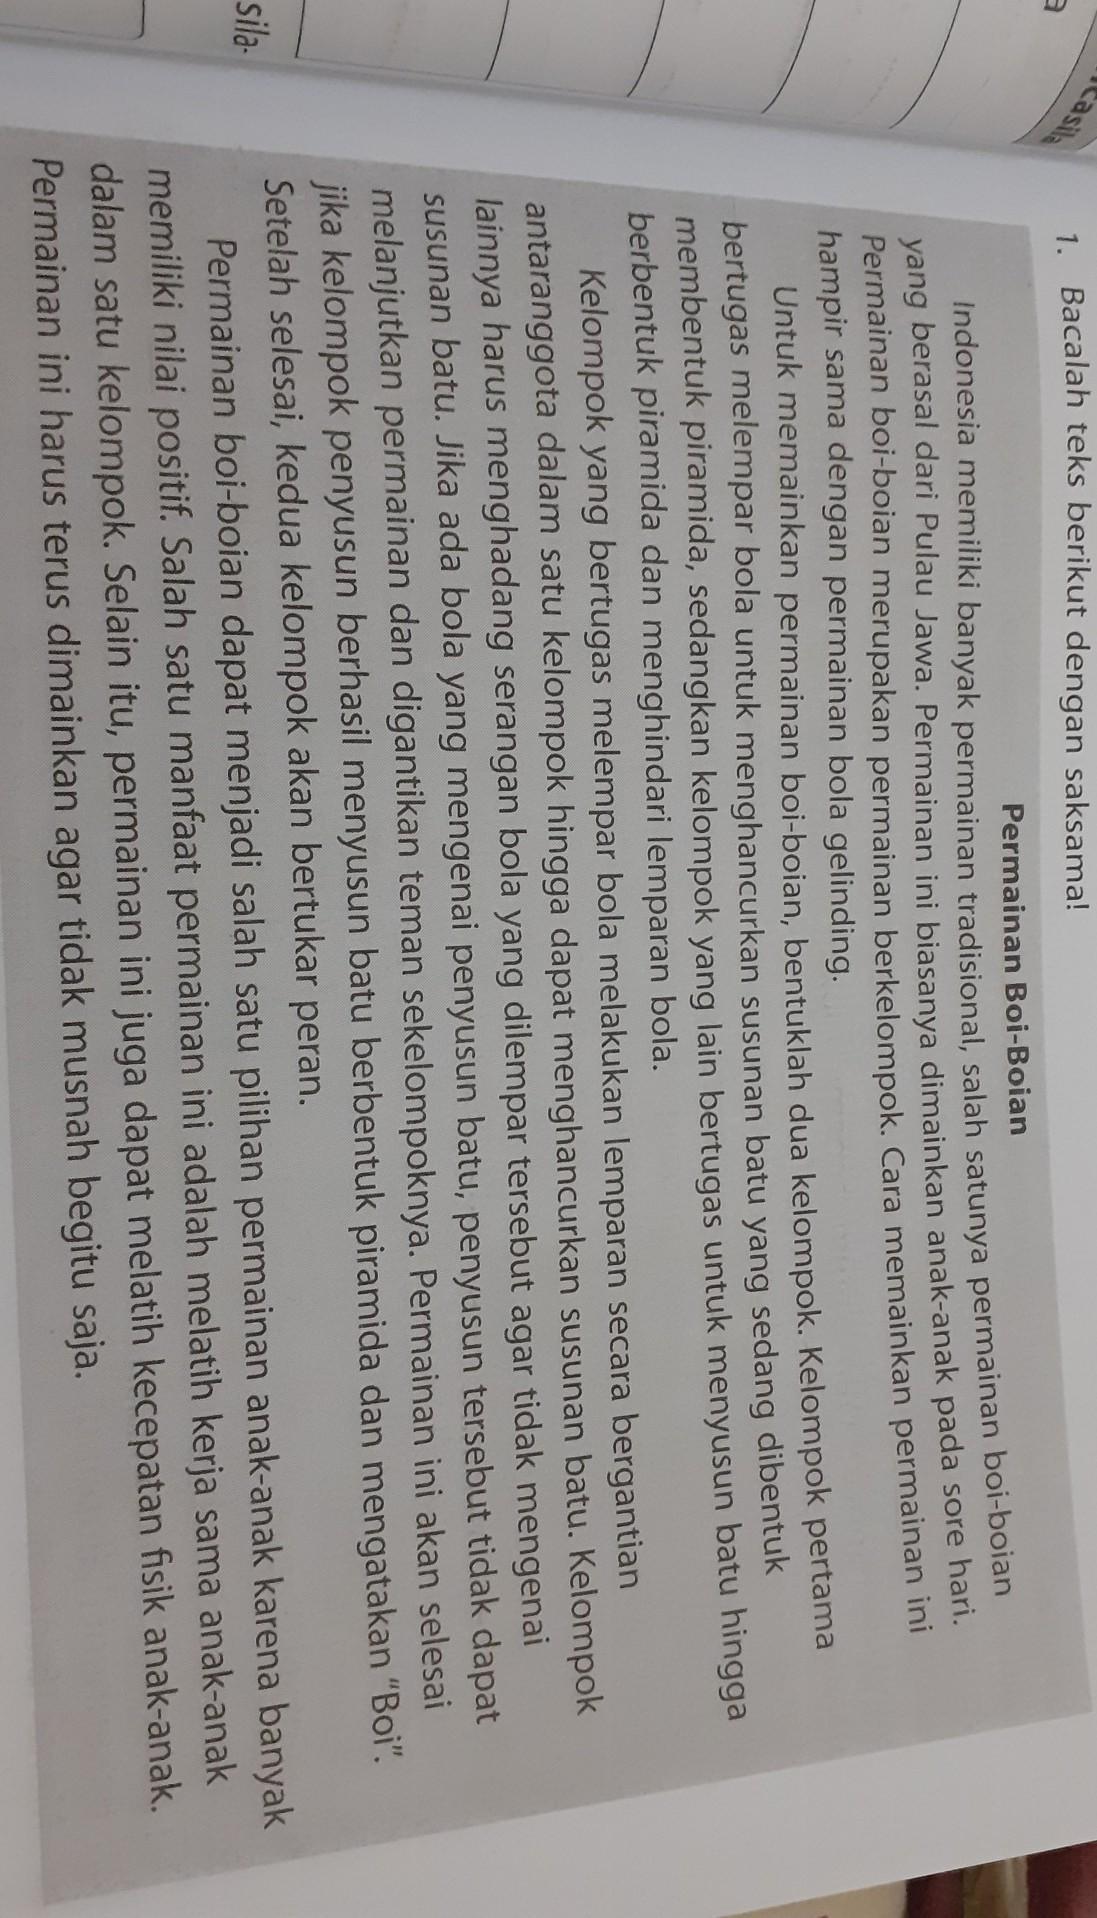 Judul Teks Ide Pokok Paragraf 1 Ide Pokok Paragraf 2 Ide Pokok Paragraf 3 Ide Pokok Brainly Co Id